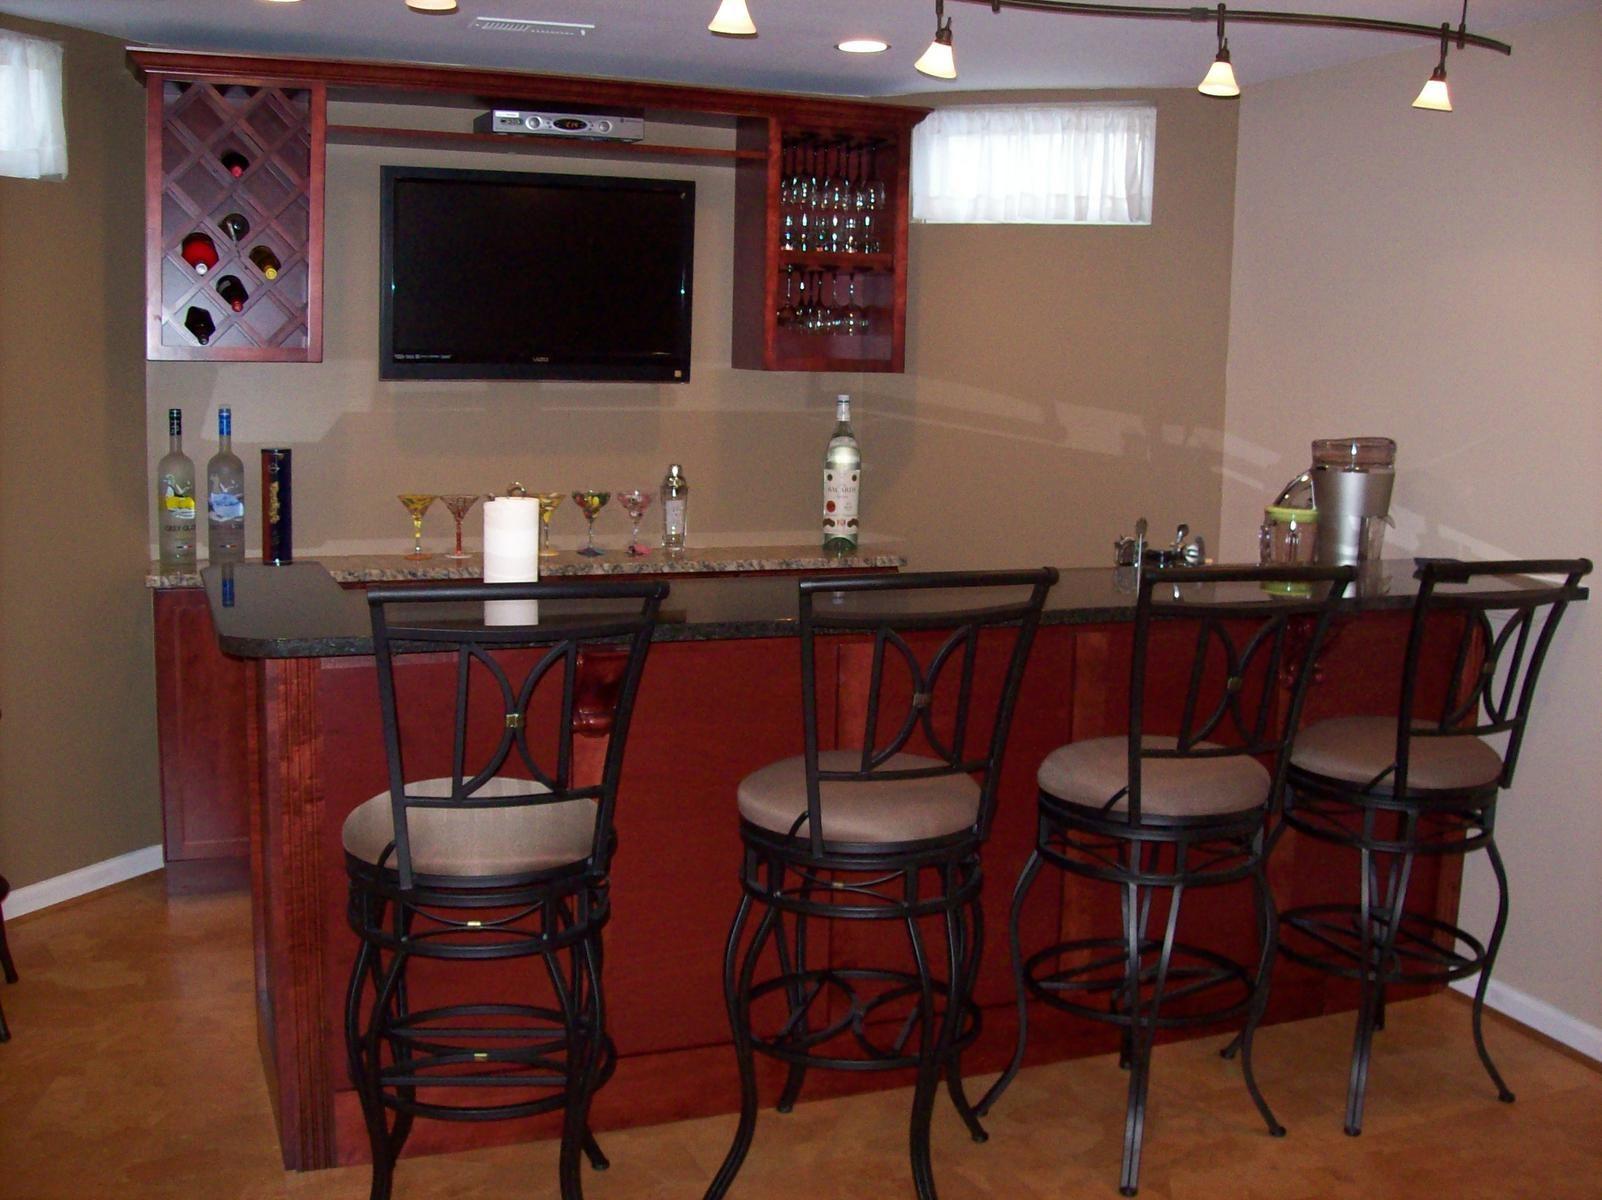 Best Images About Basement Bar Ideas On Pinterest Basement - Diy basement bars